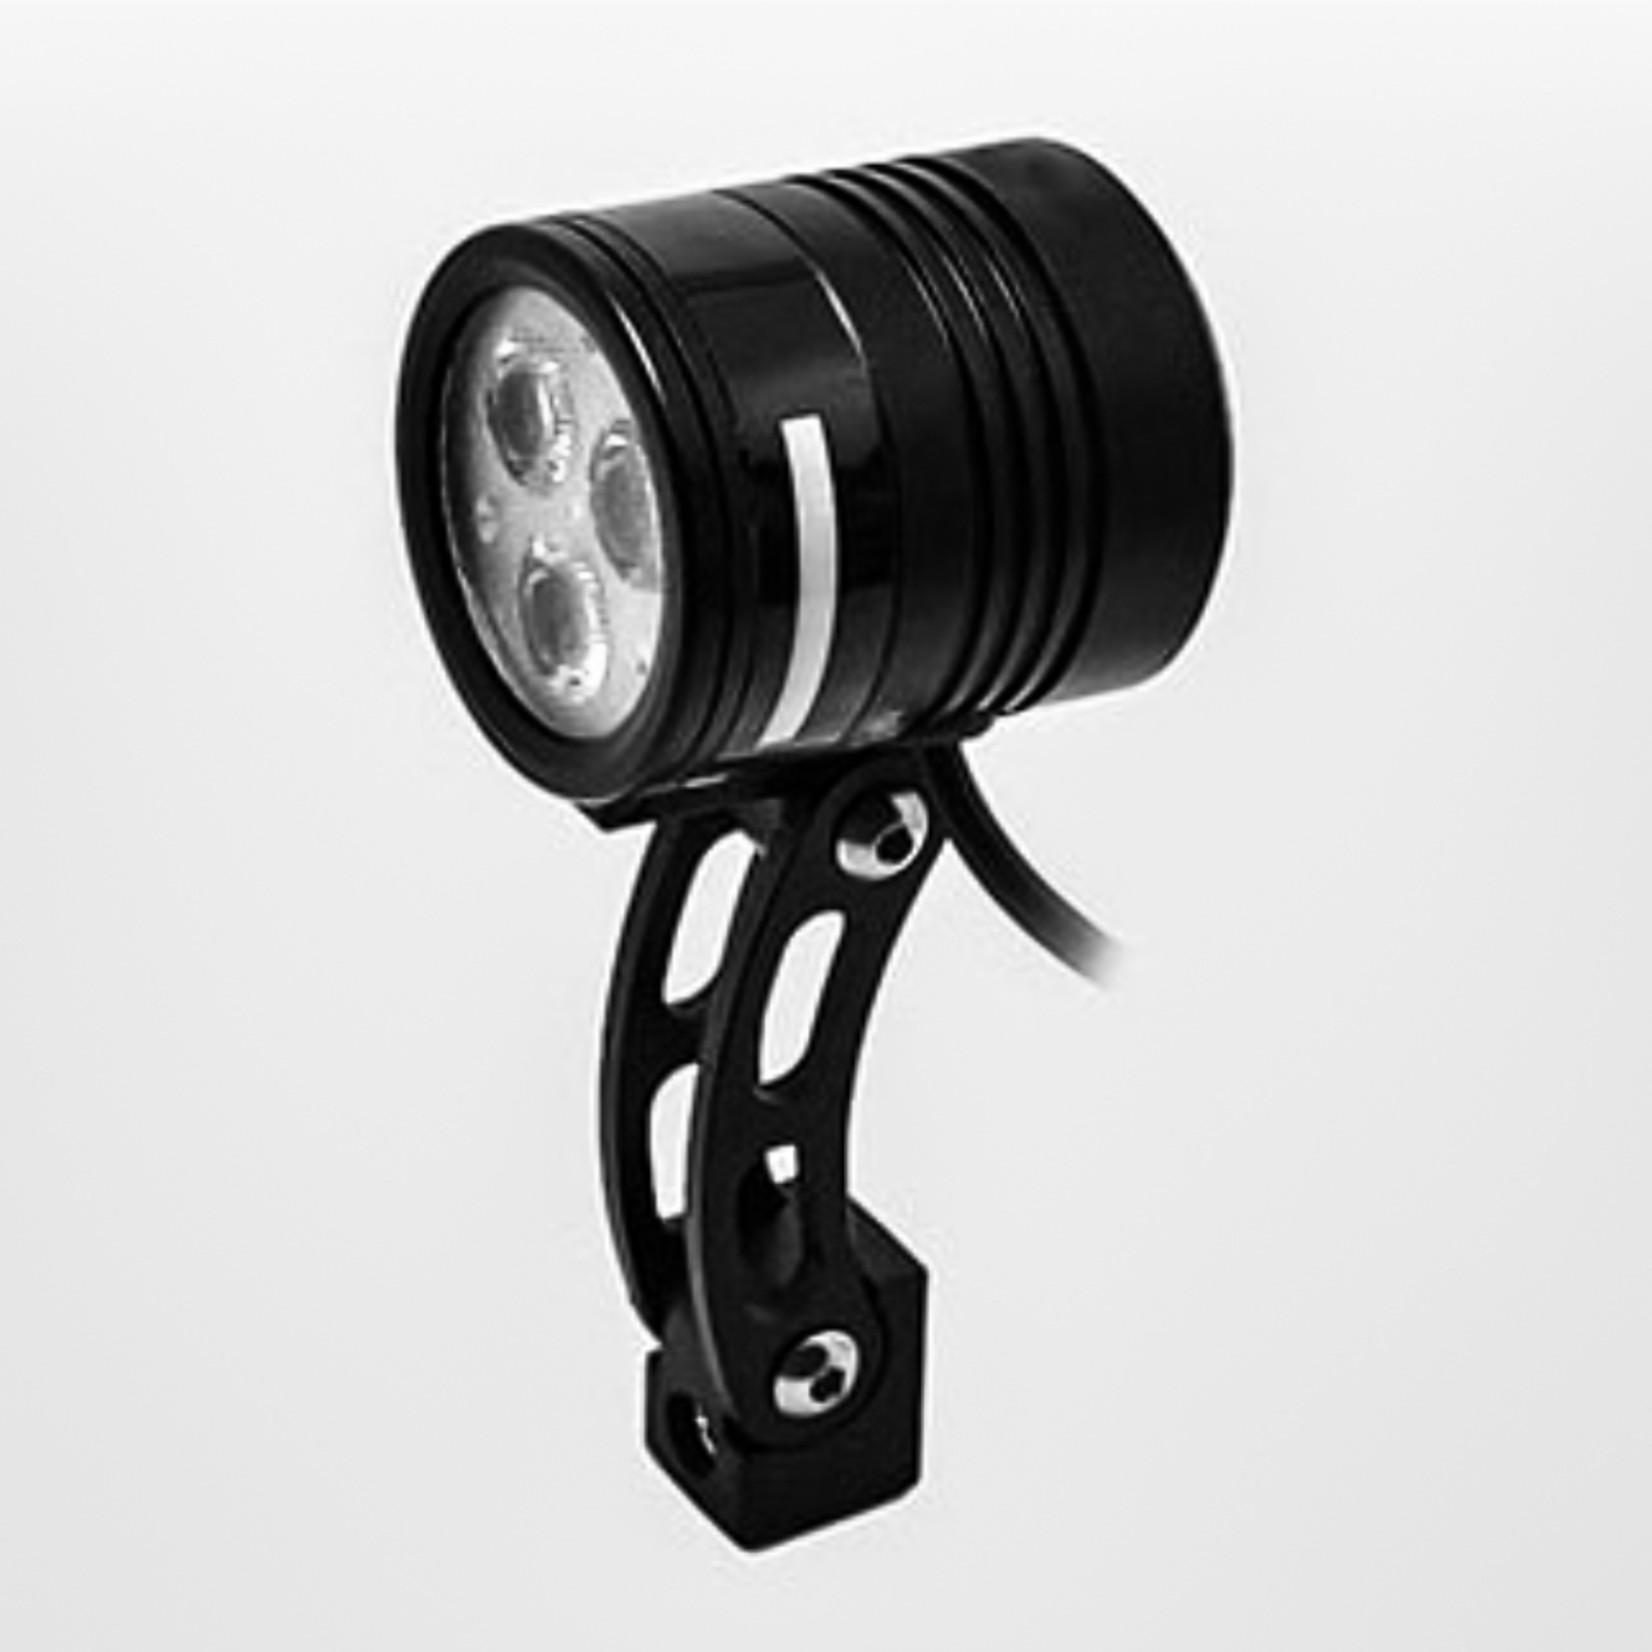 Kasai Trail Beam Dynamo Headlight, Black